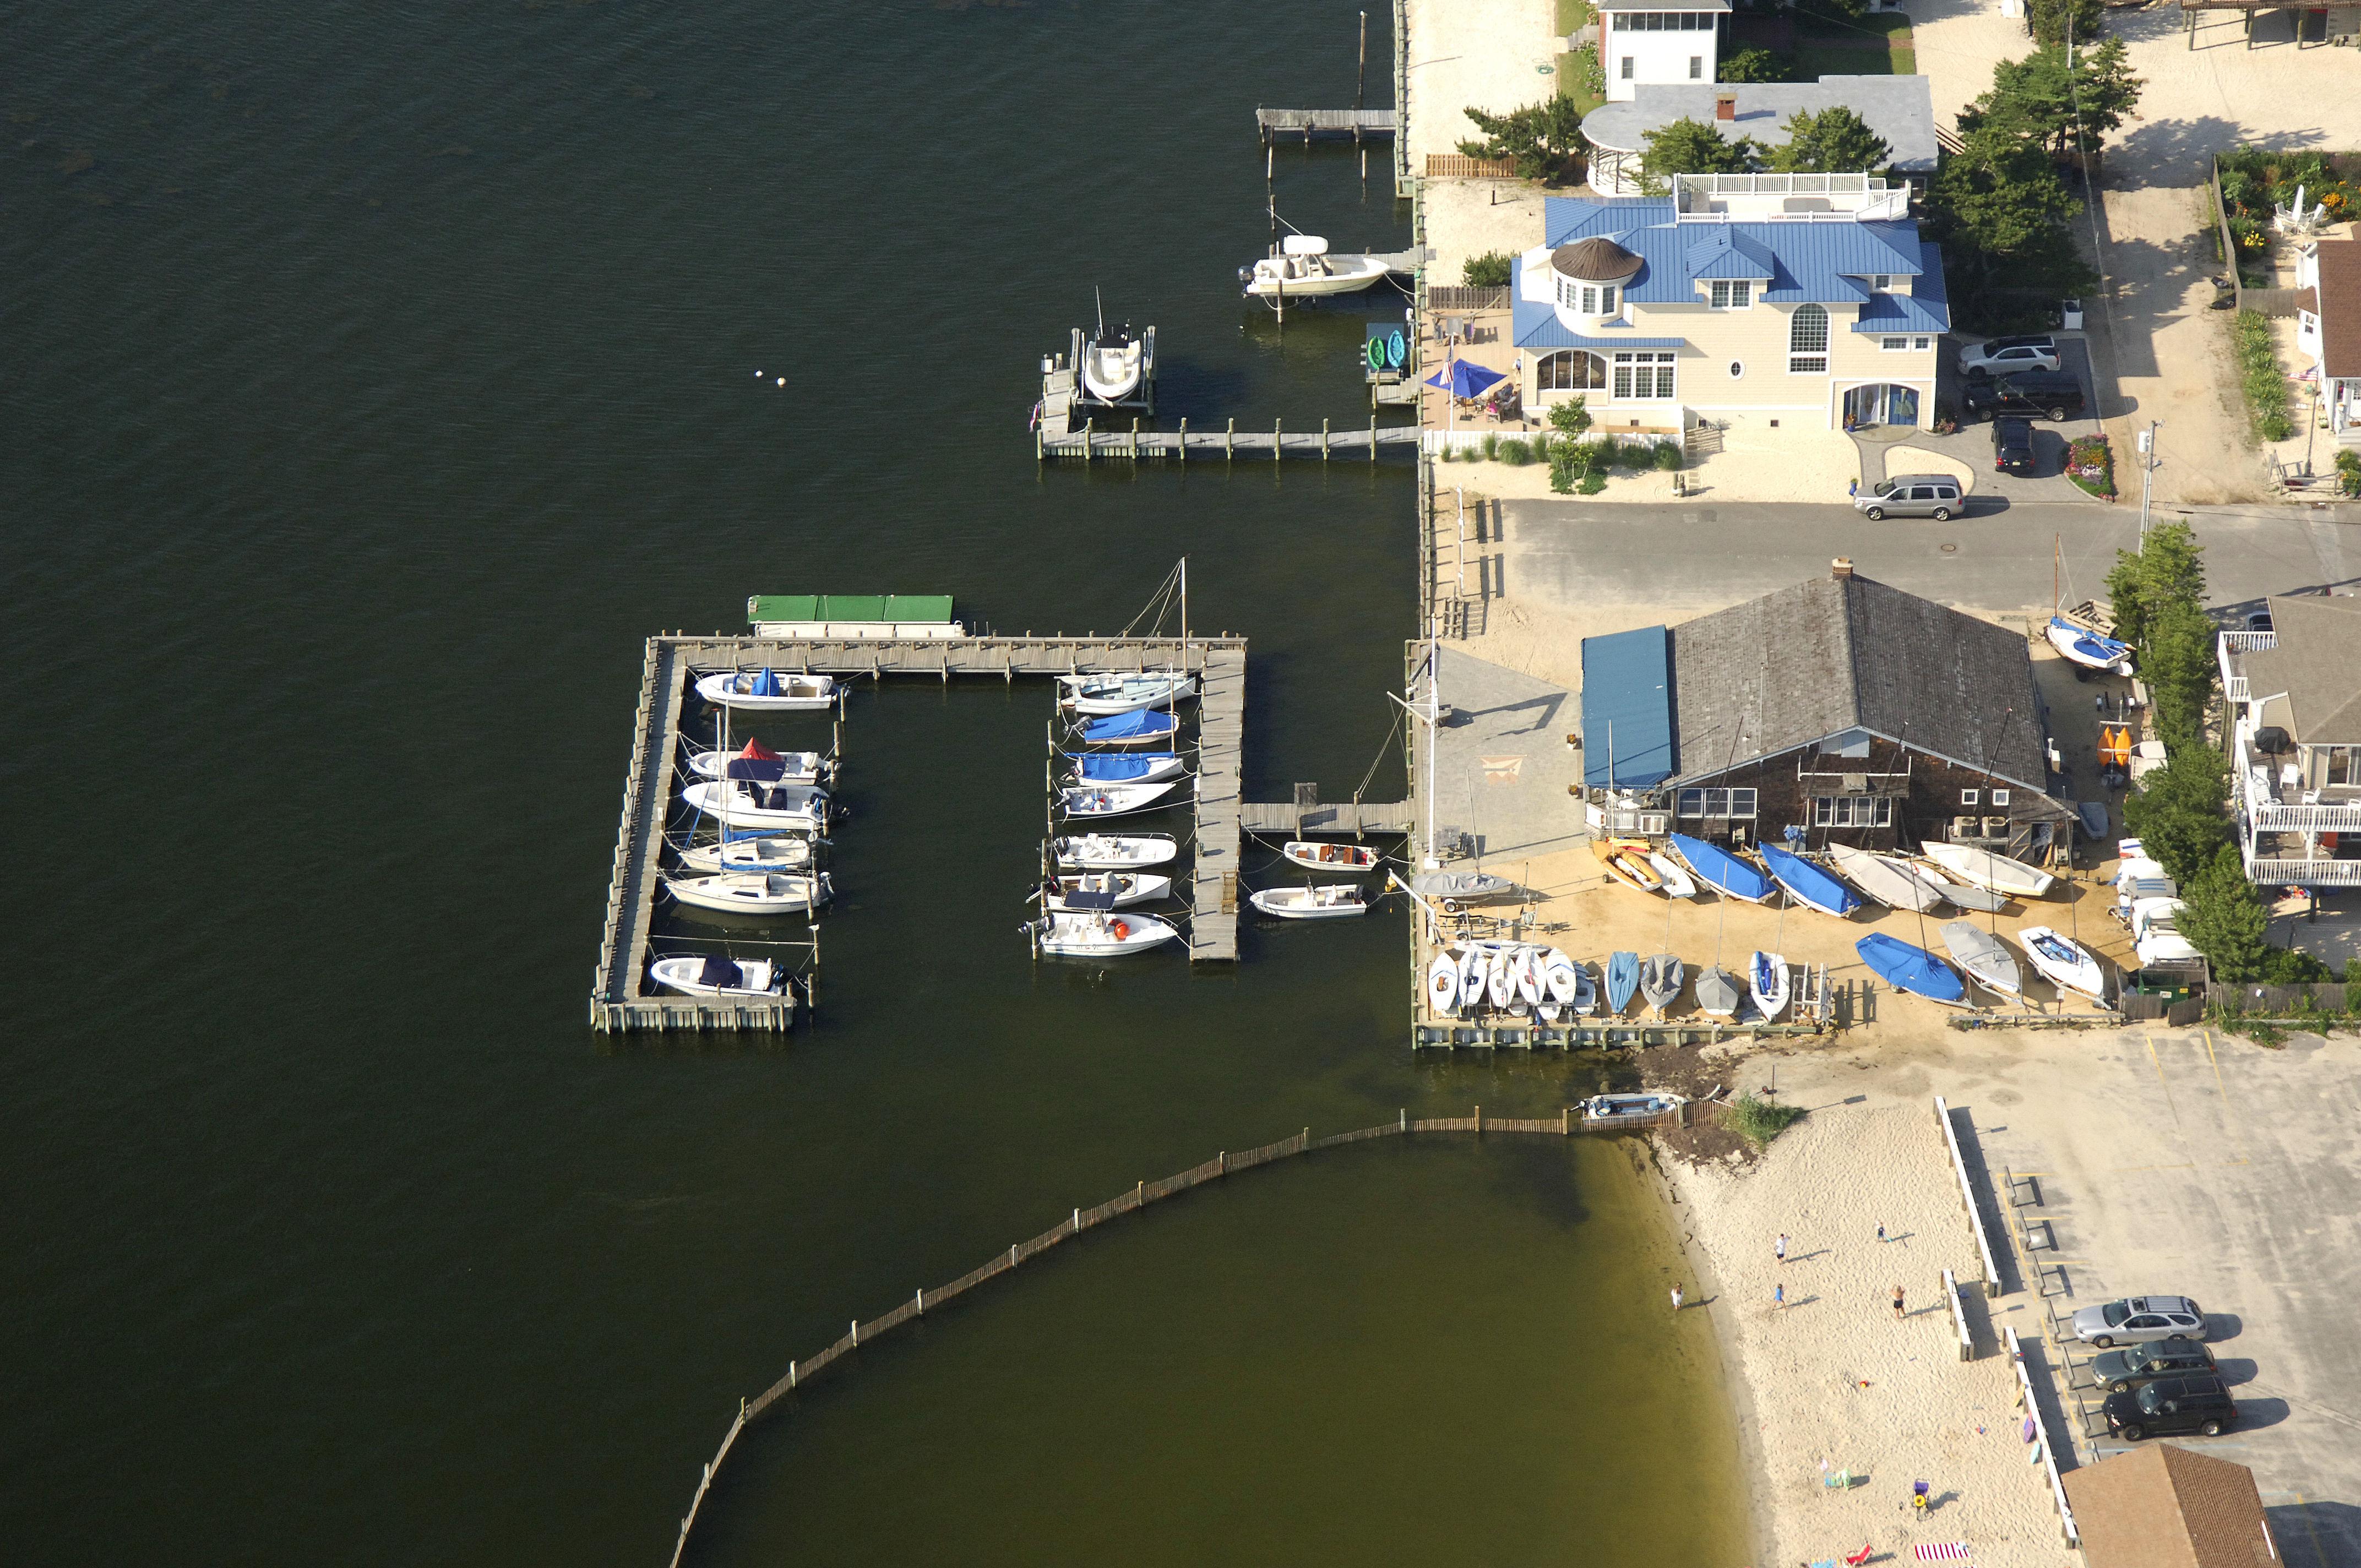 Barnegat Light Yacht Club in Harvey Cedars NJ United States